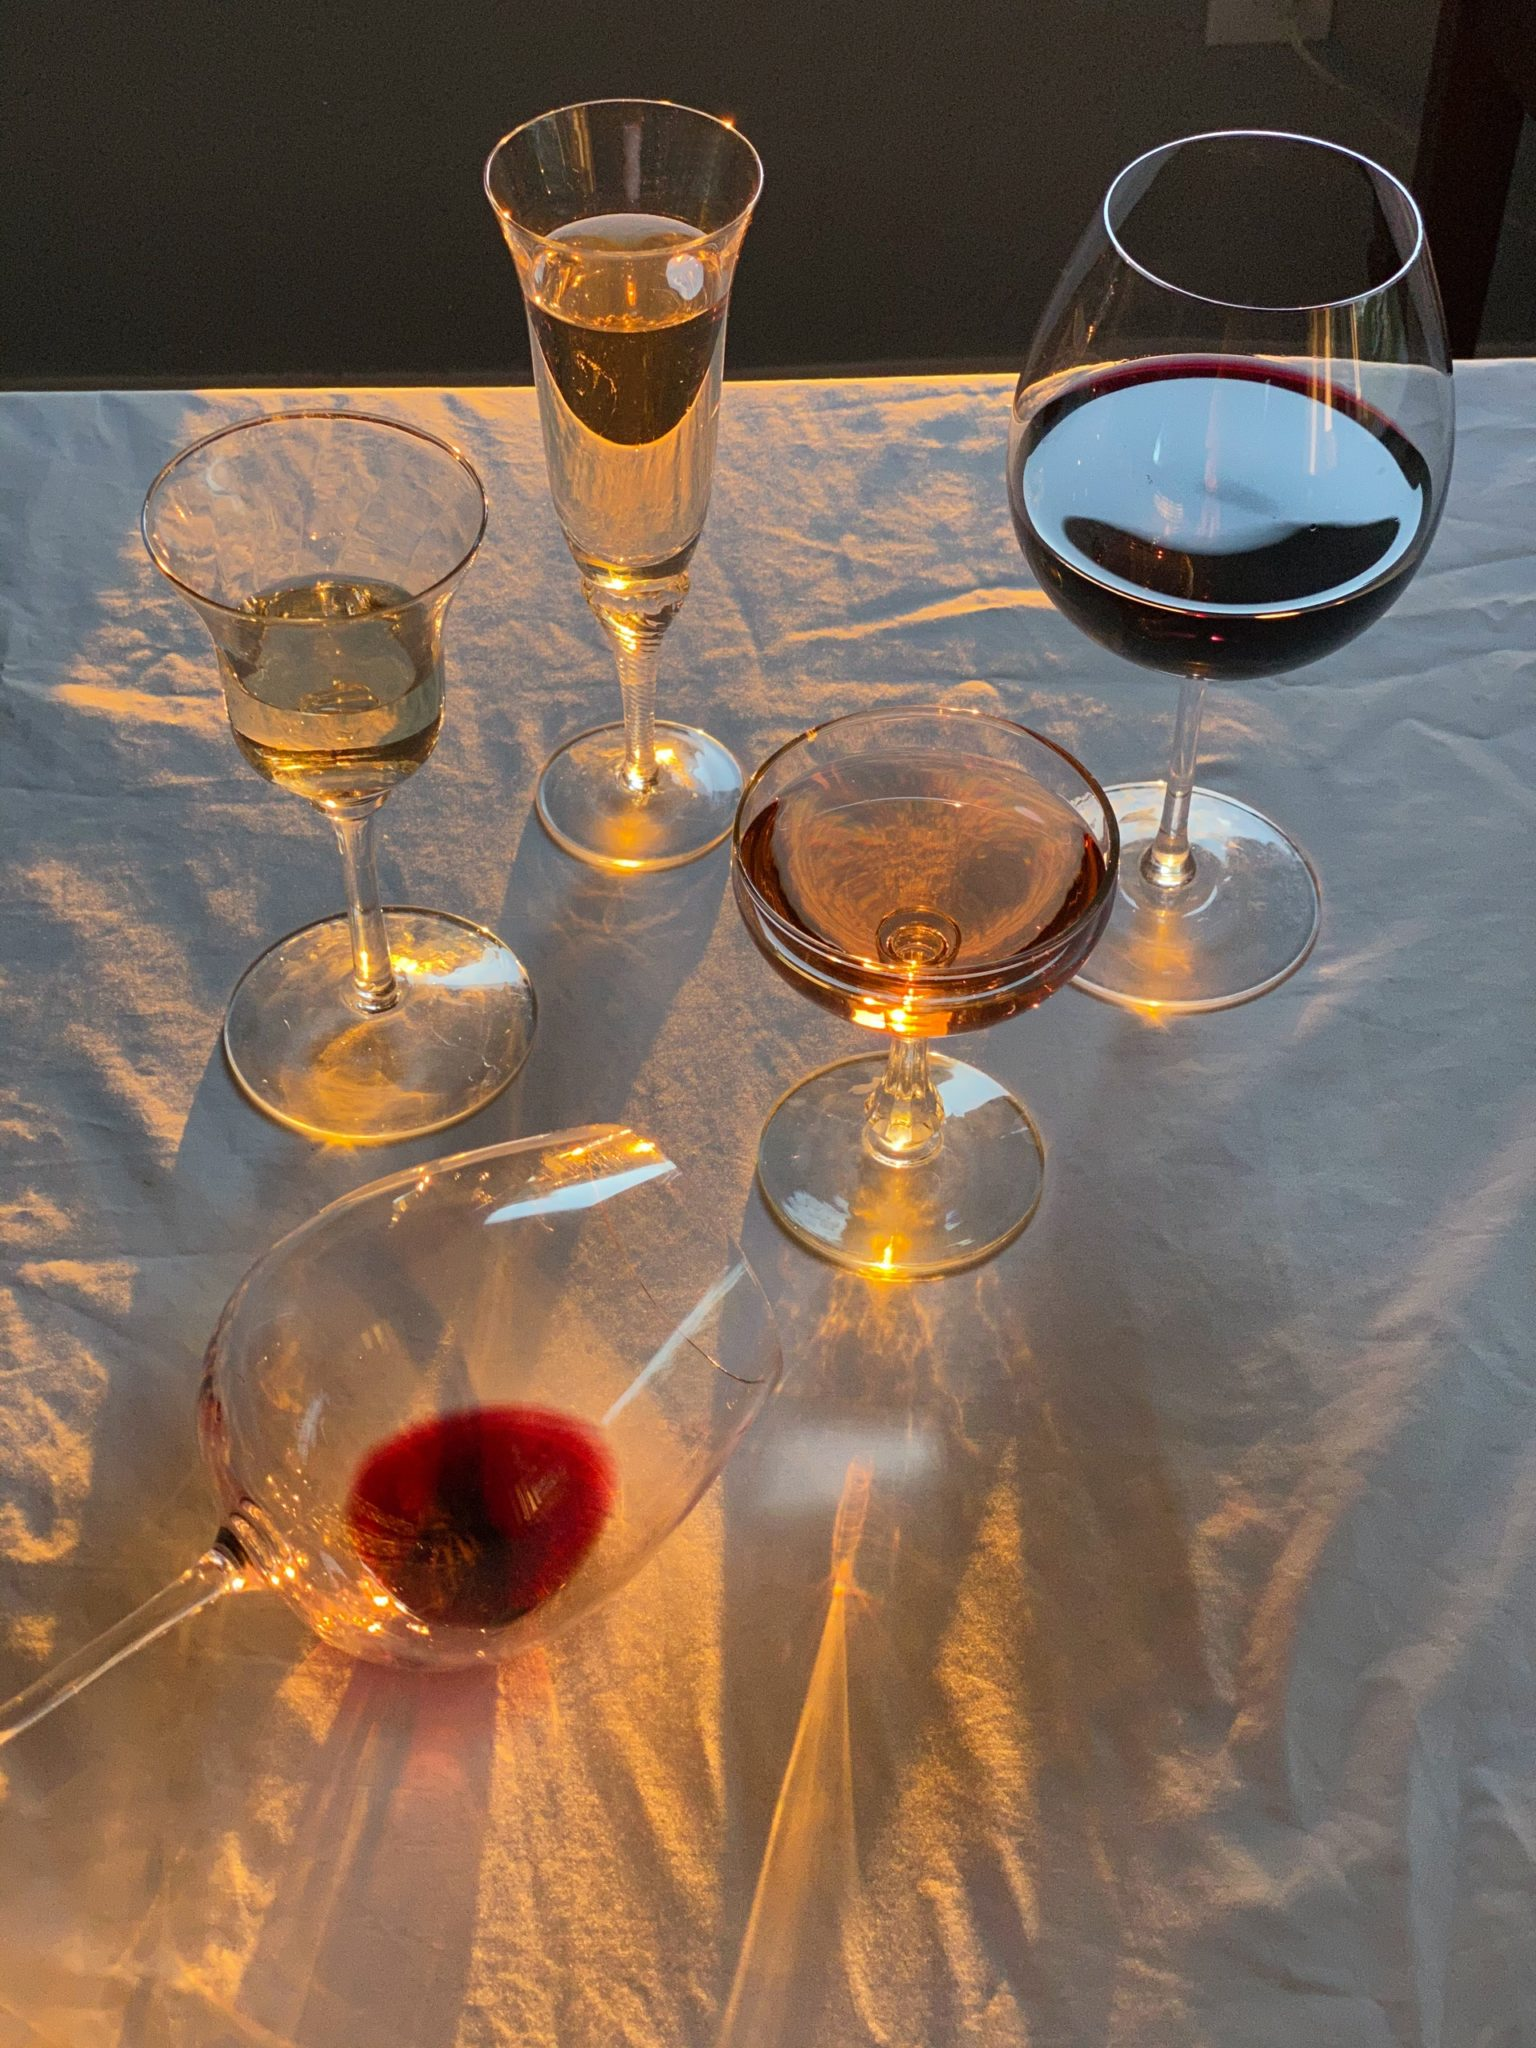 Verres alcool vides fin soirée